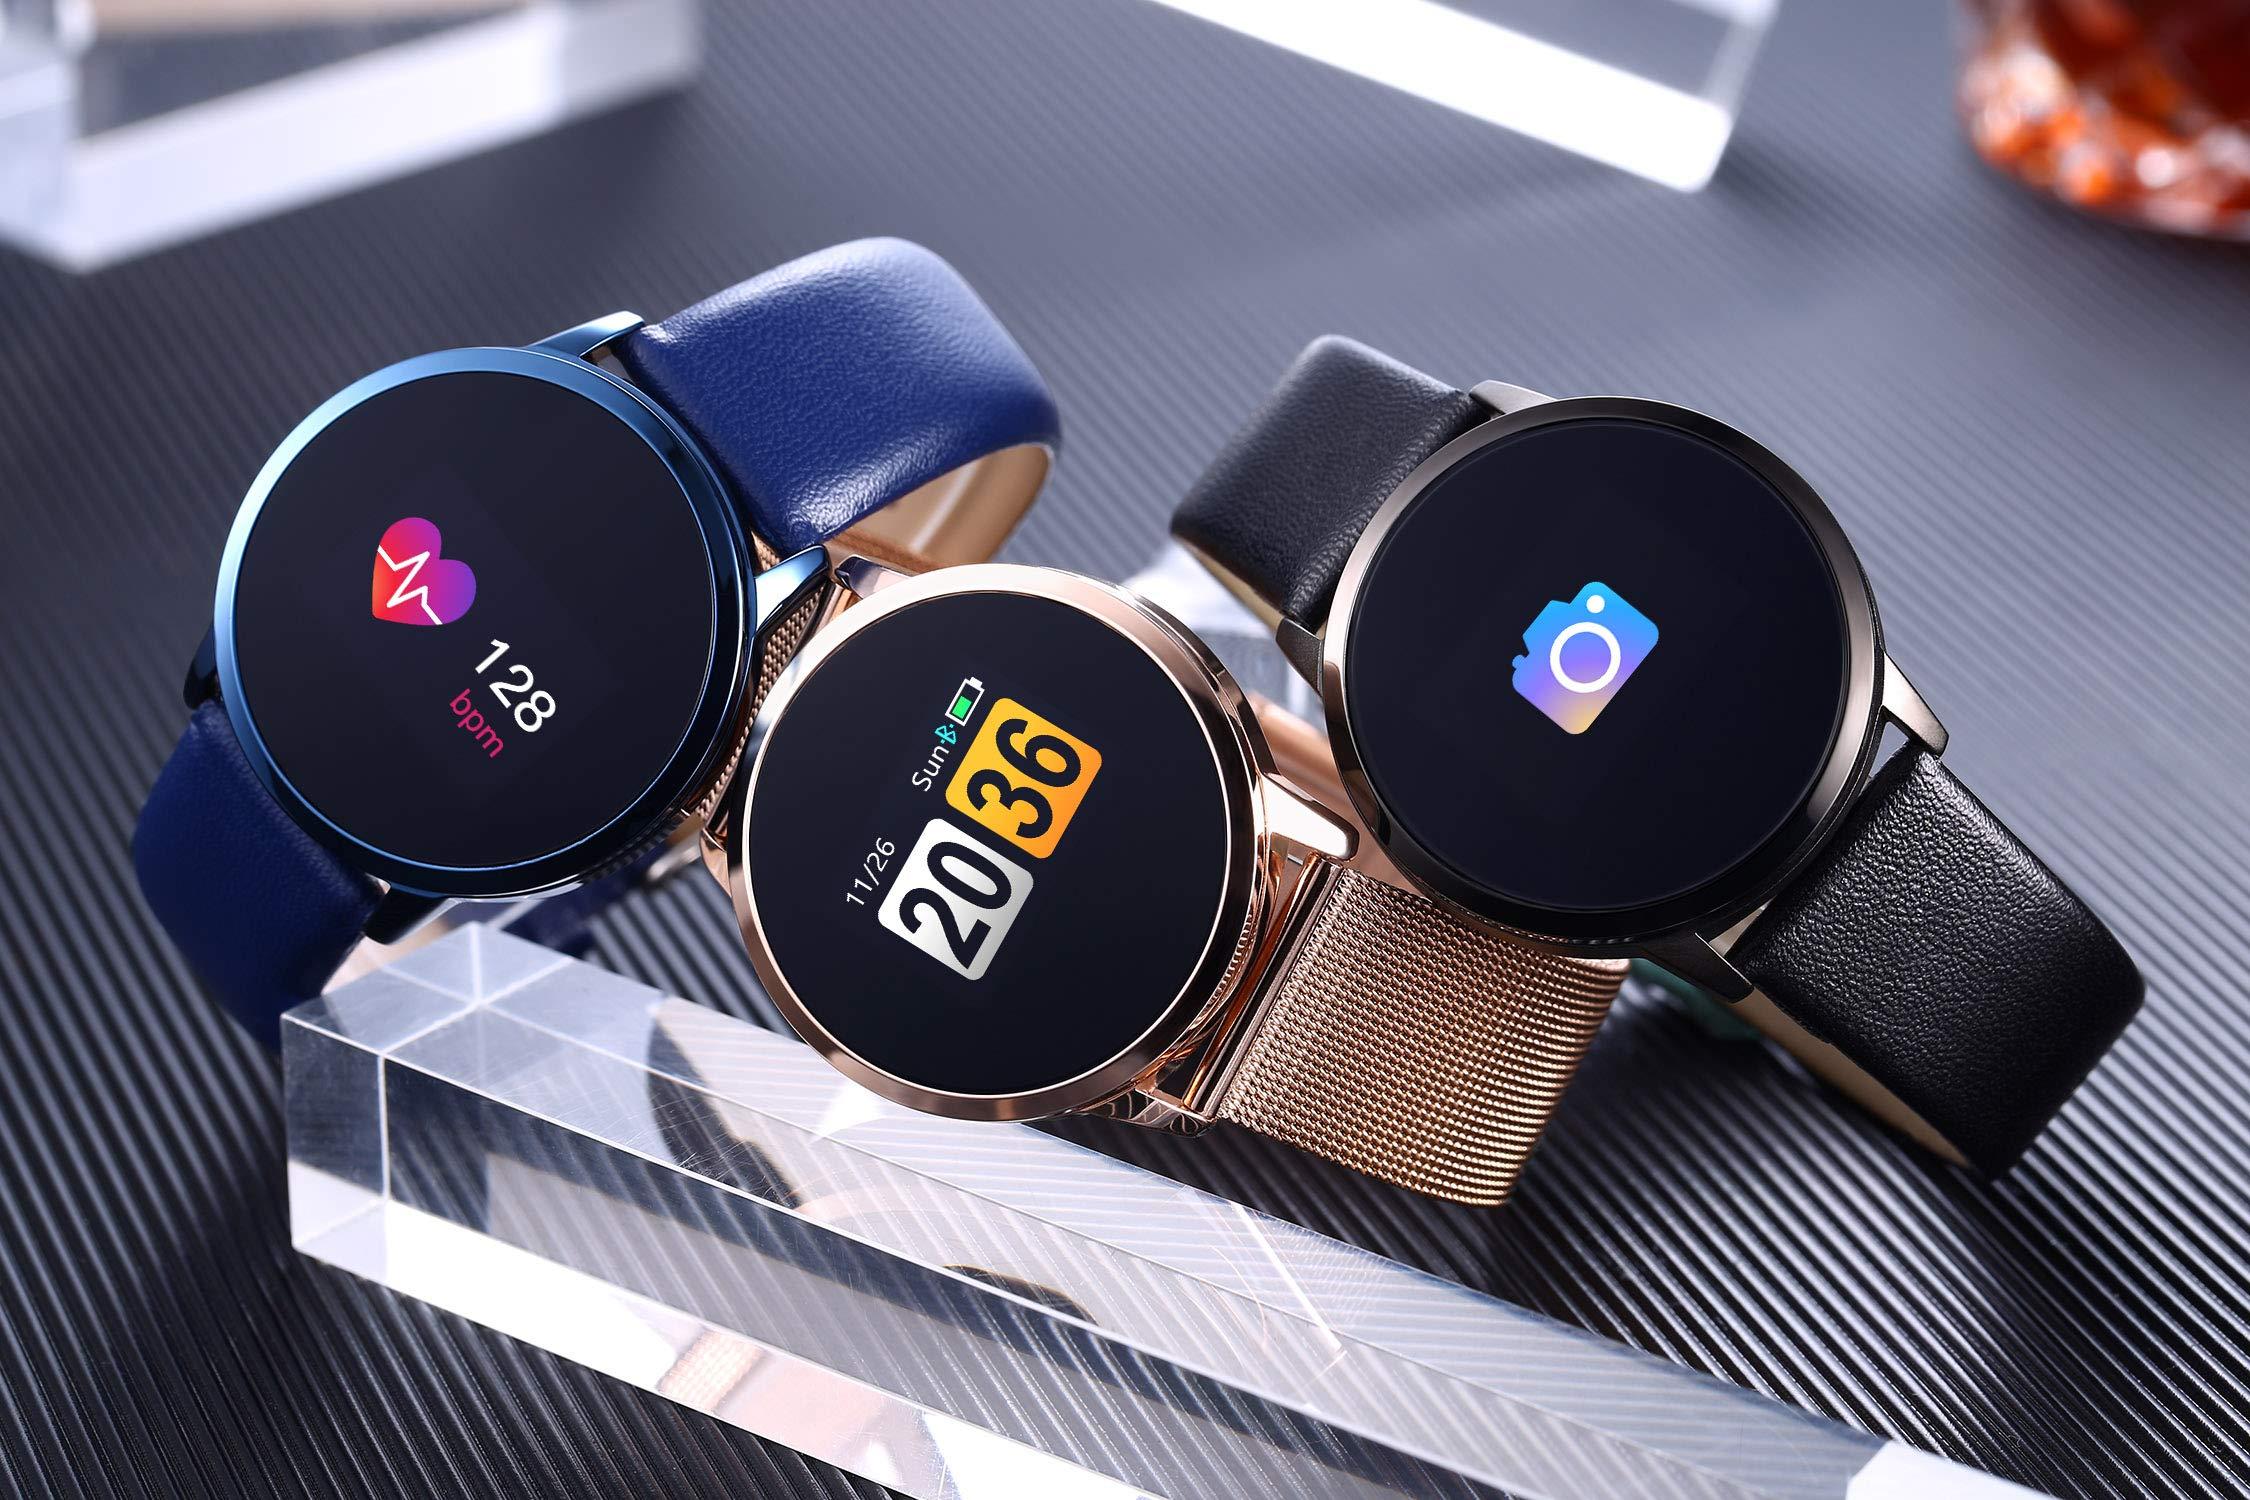 Adsvtech Smartwatch, Impermeable Reloj Inteligente Mujer Hombre, Pulsera Actividad Inteligente Reloj Deportivo Reloj… 8